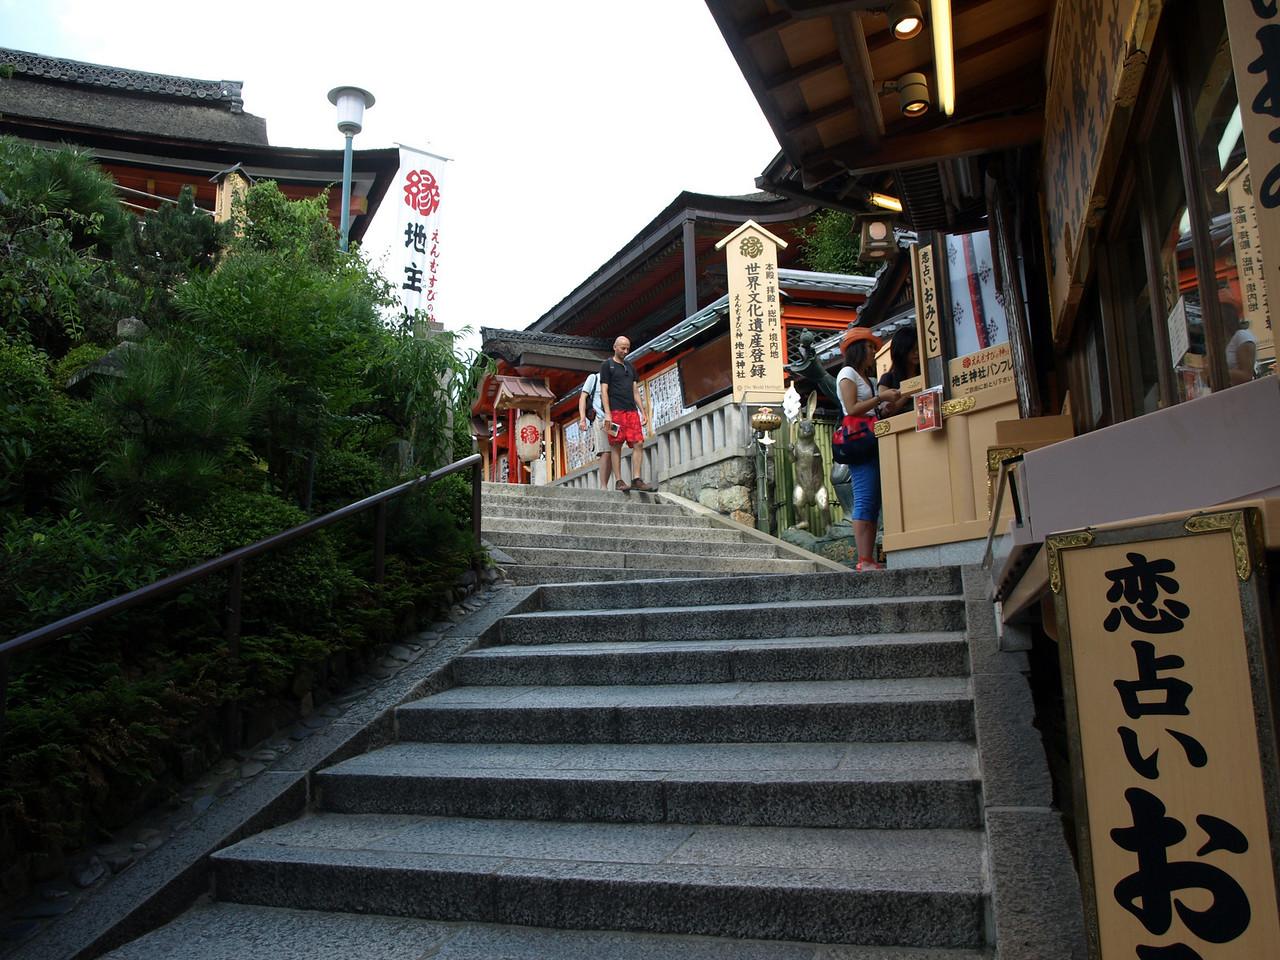 We continue our climb up to the Jishu Shrine